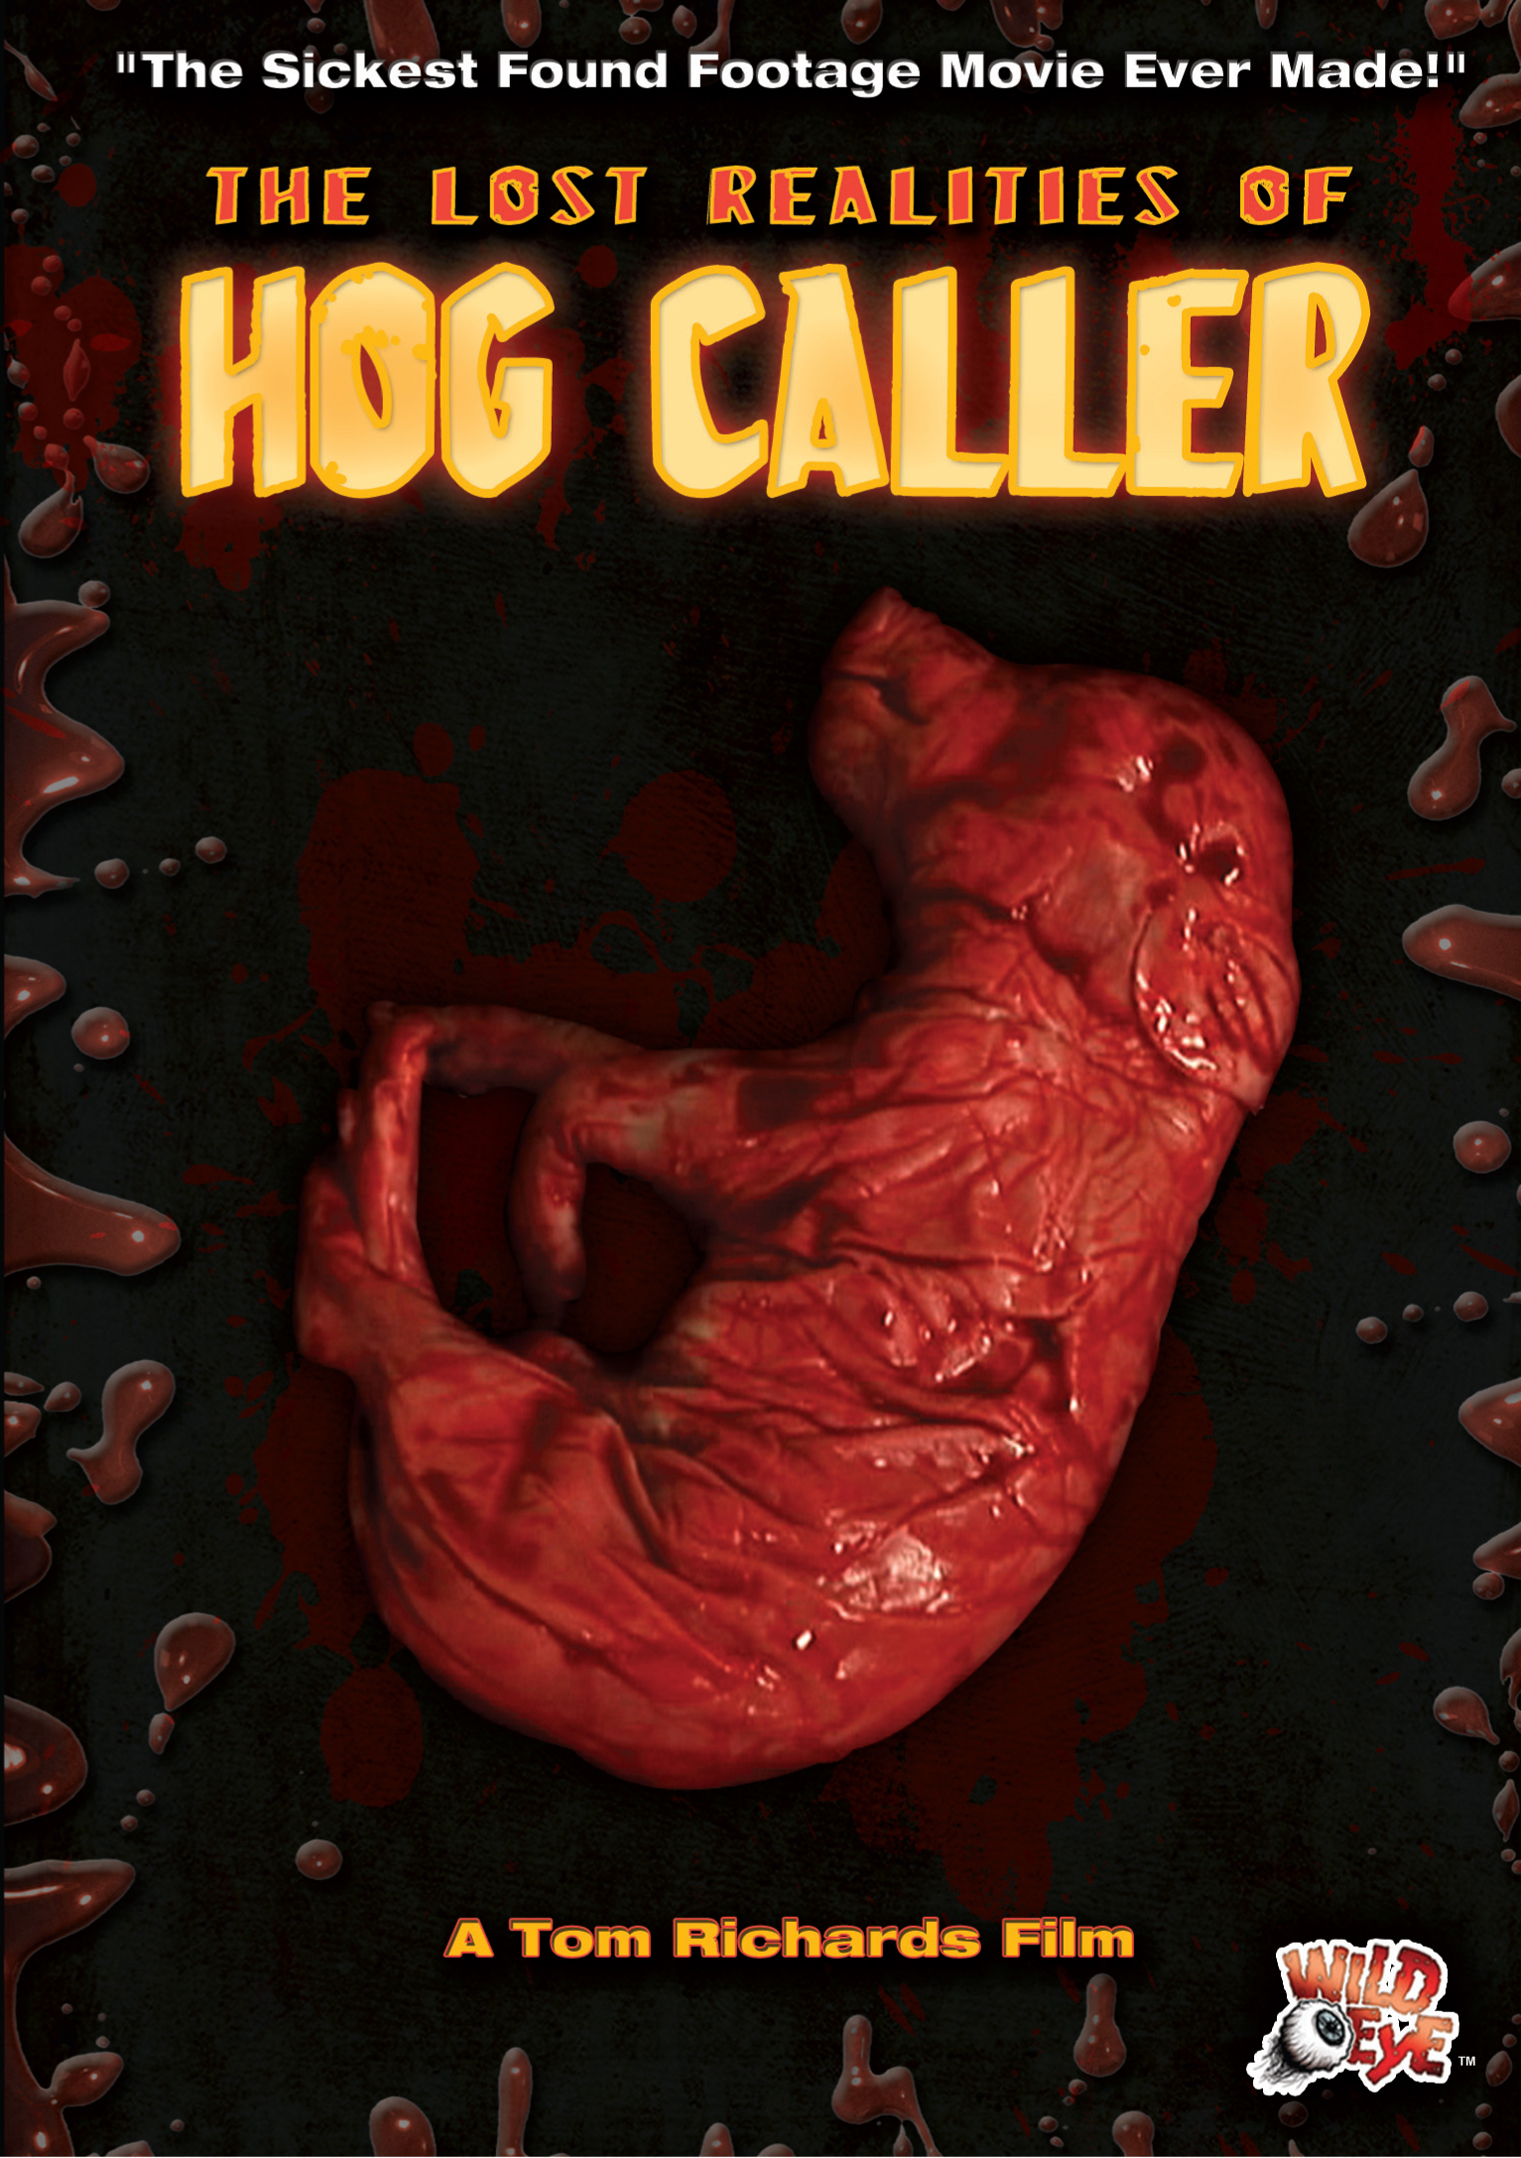 The Lost Realities of Hog Caller